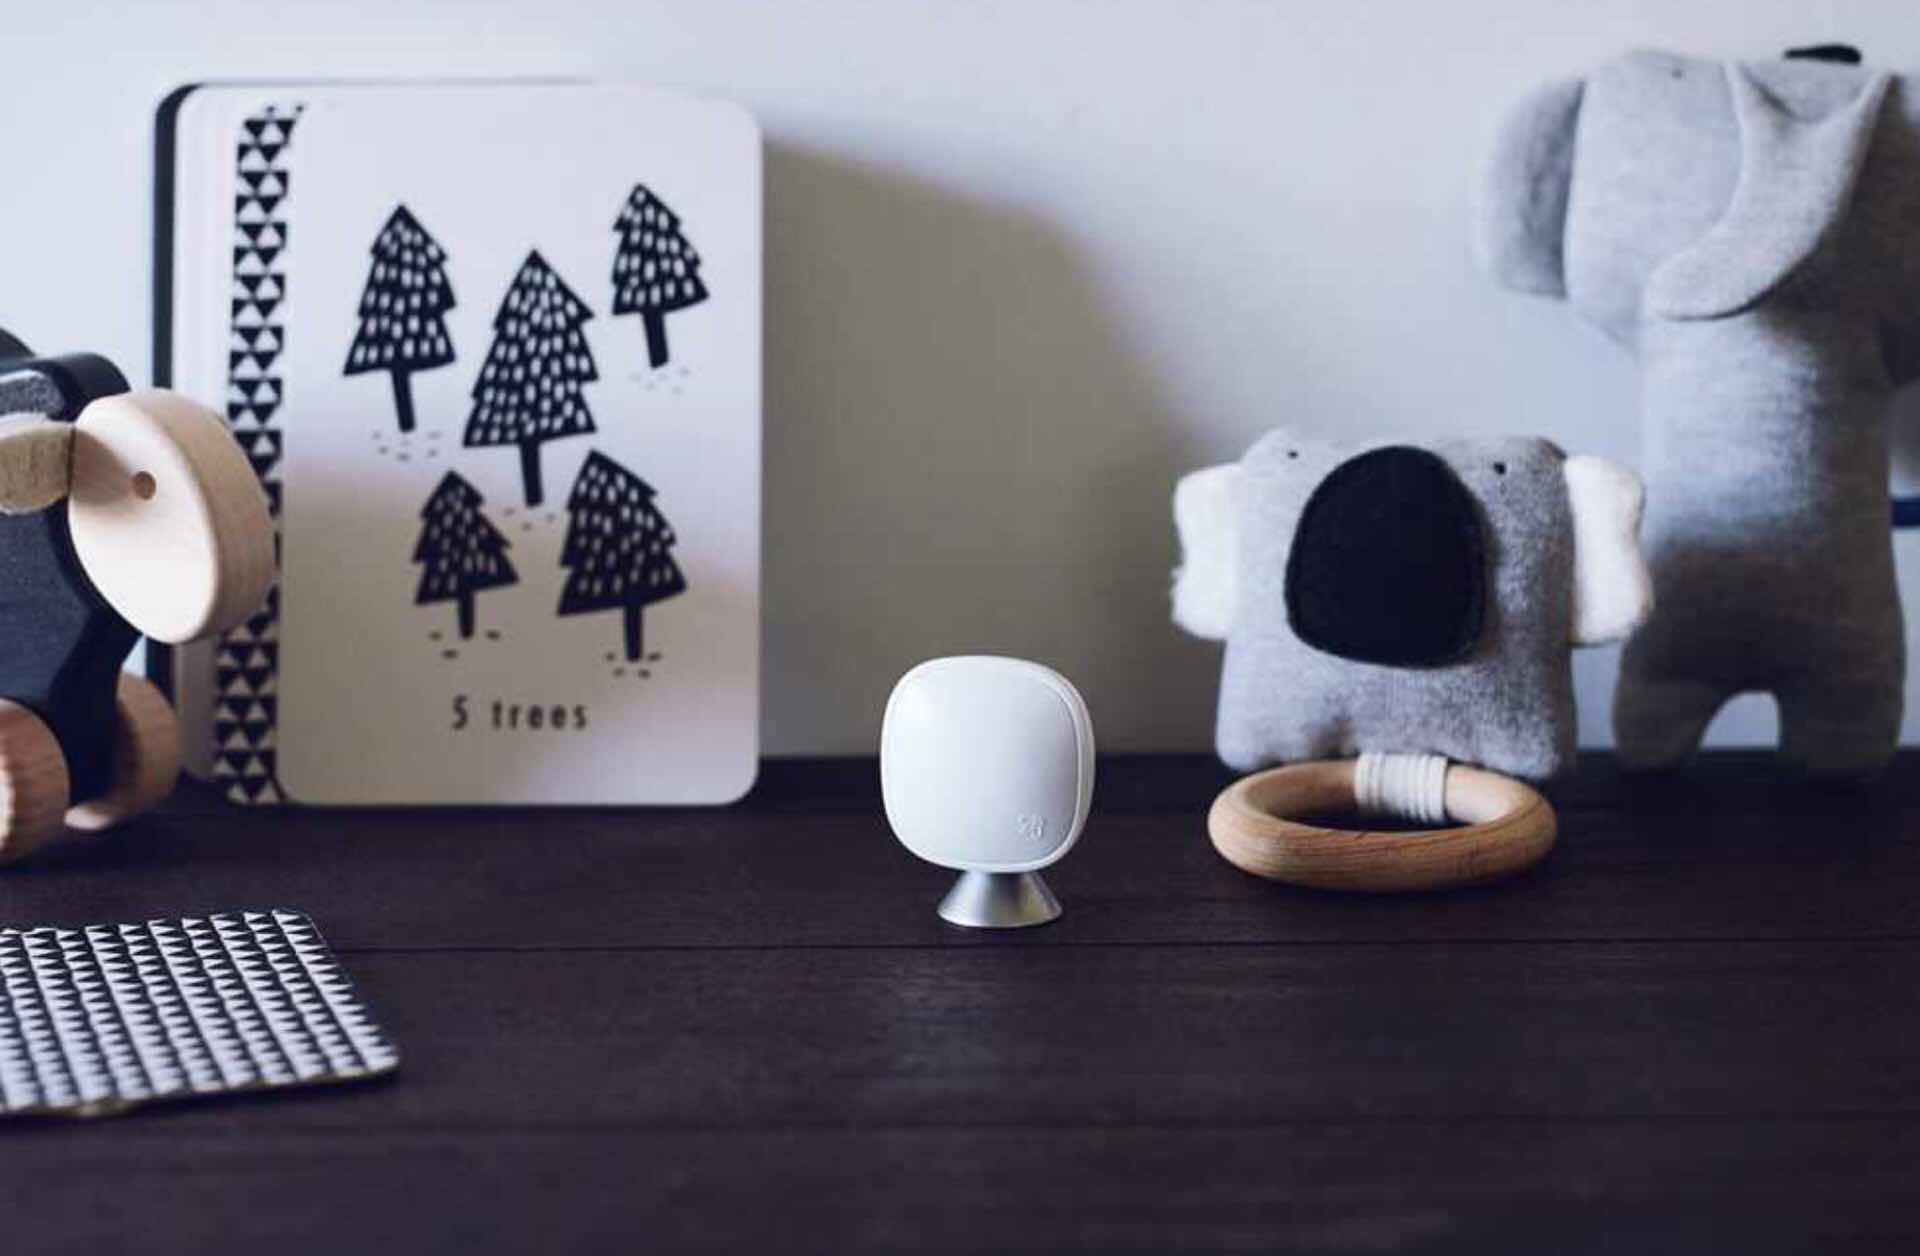 ecobee-smartthermostat-smartsensor